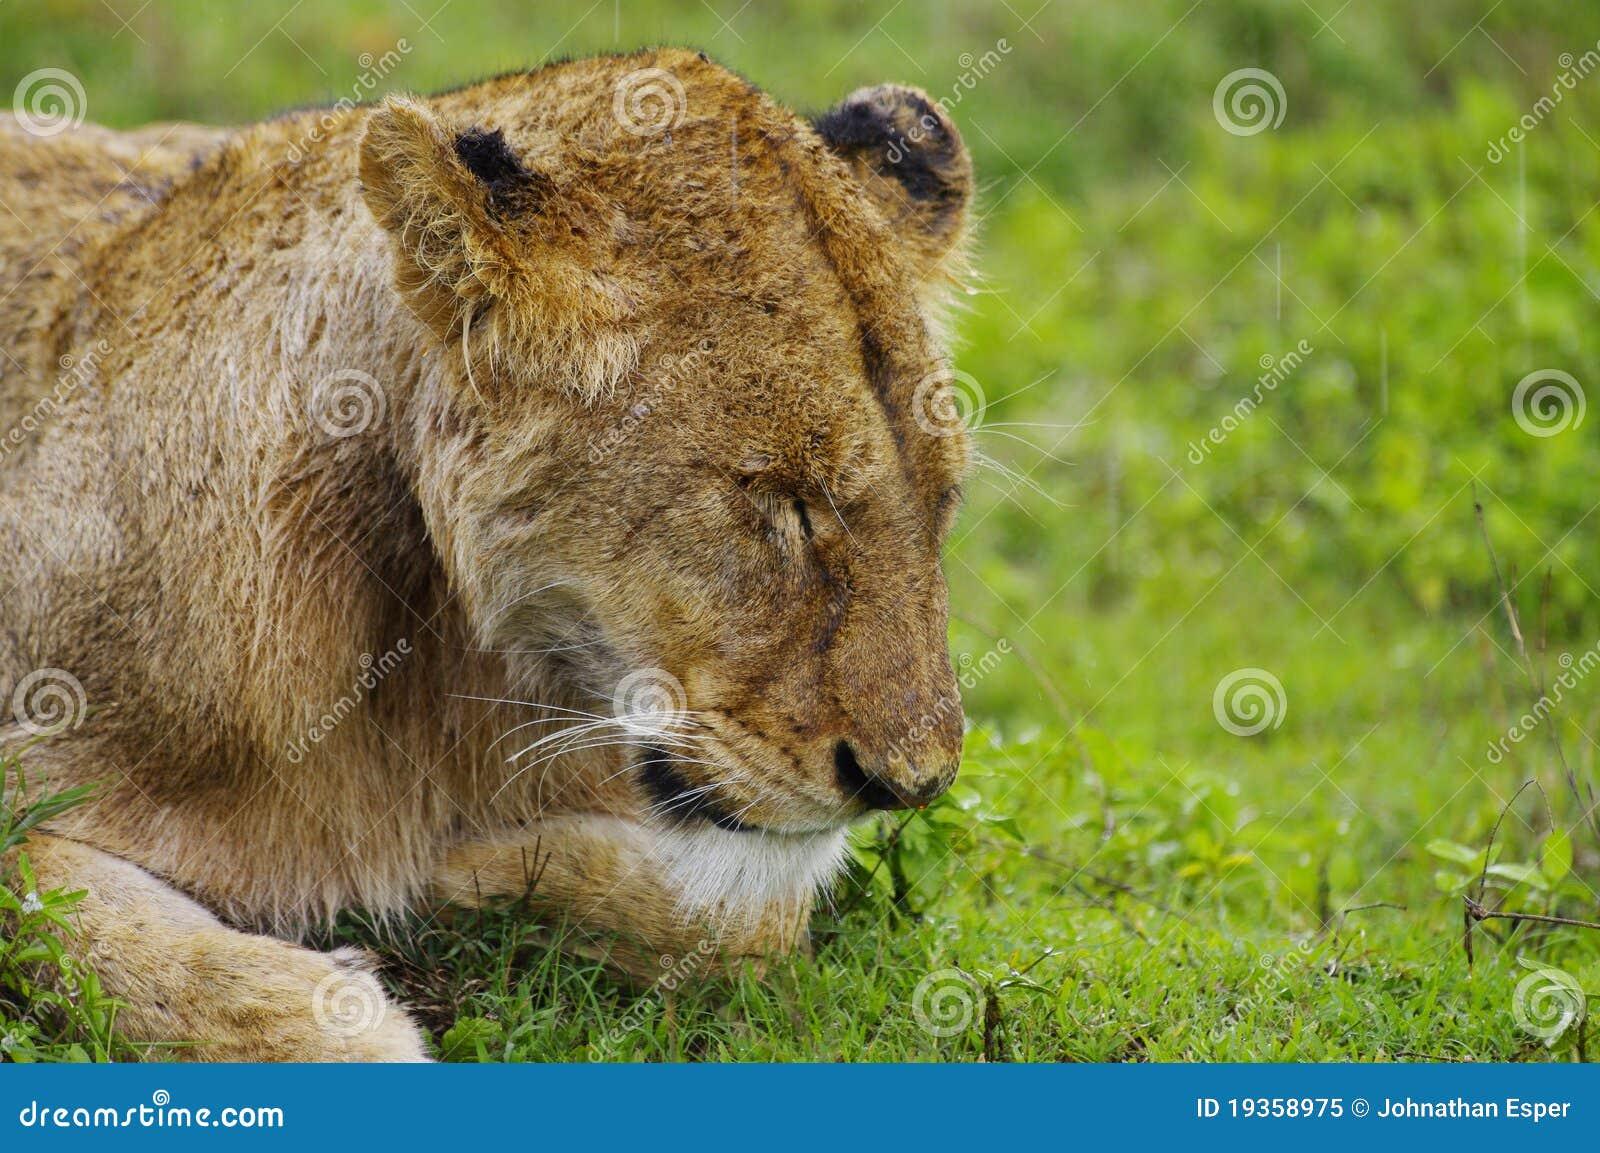 Leão que napping na chuva, cratera de Ngorogoro